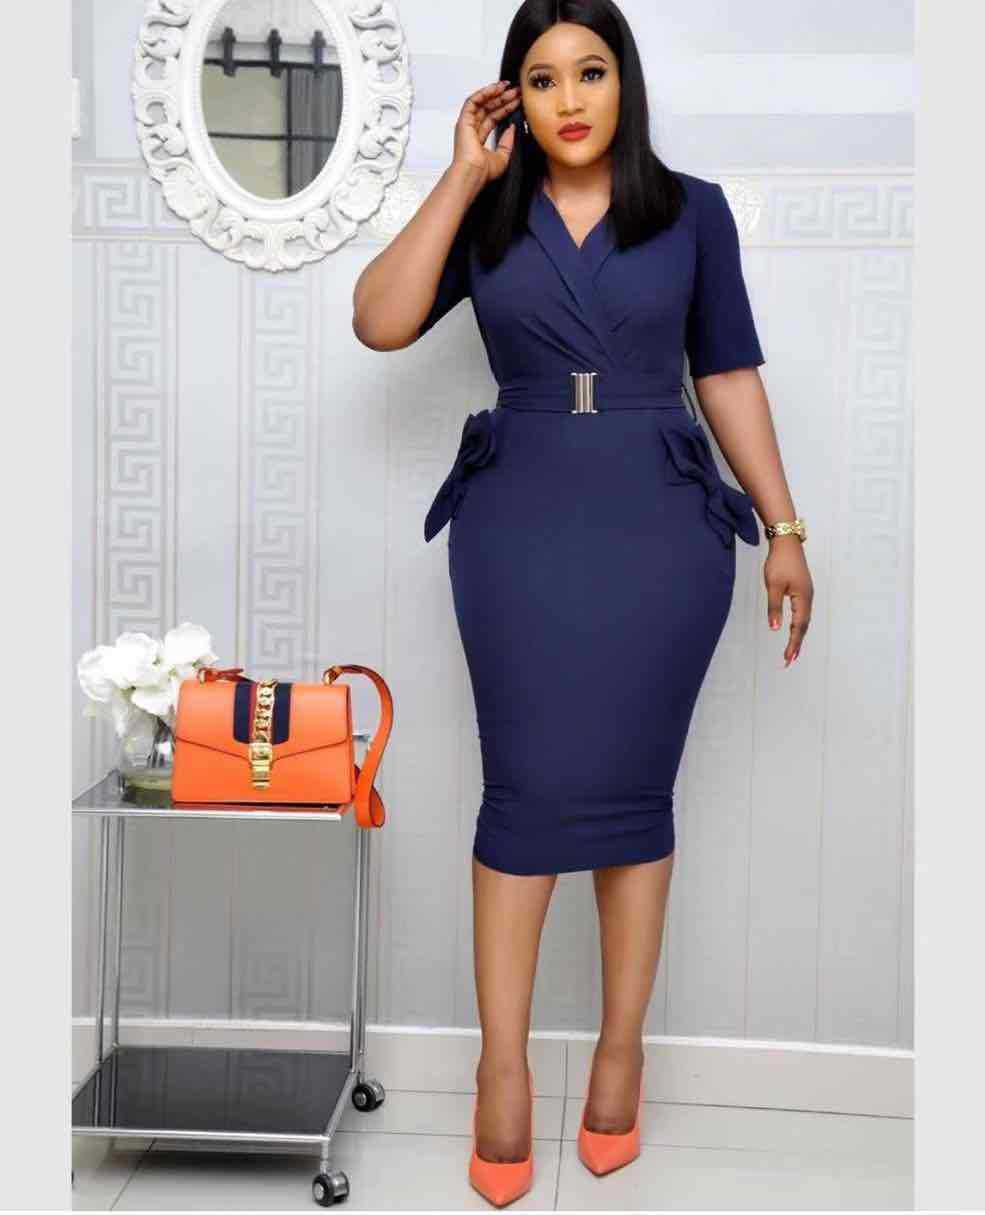 2019 Elegent Fashion Style Summer African Women V-neck Plus Size Knee-length Dress M-XXL